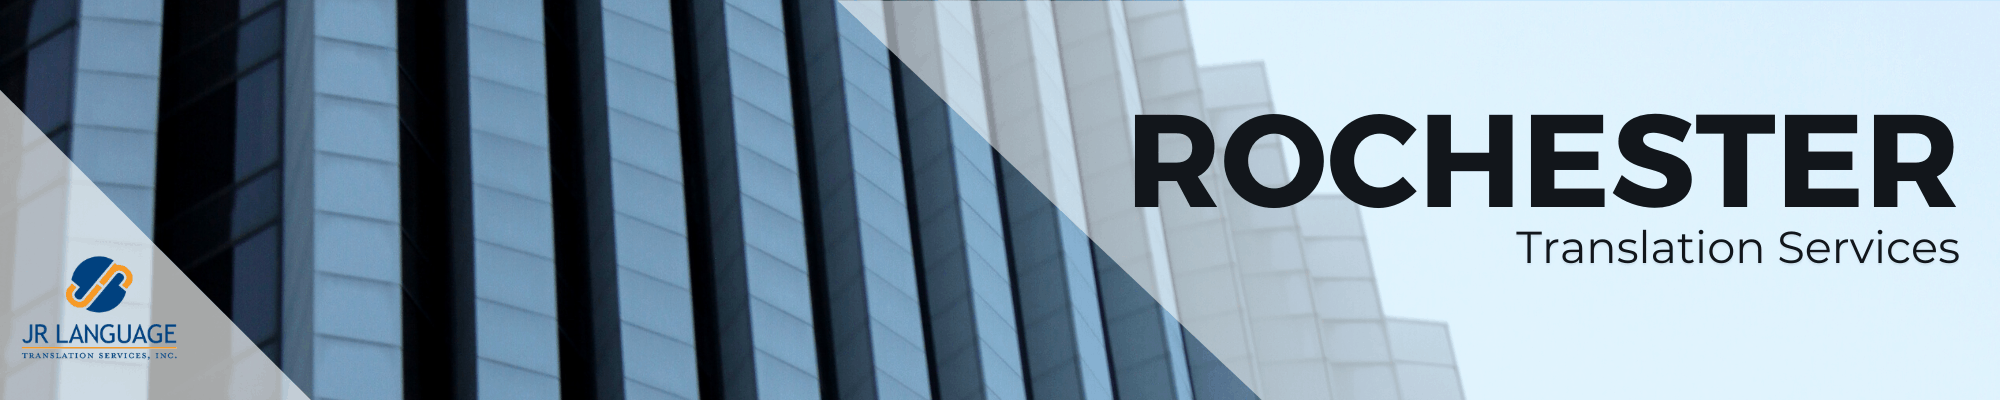 rochester translation services company